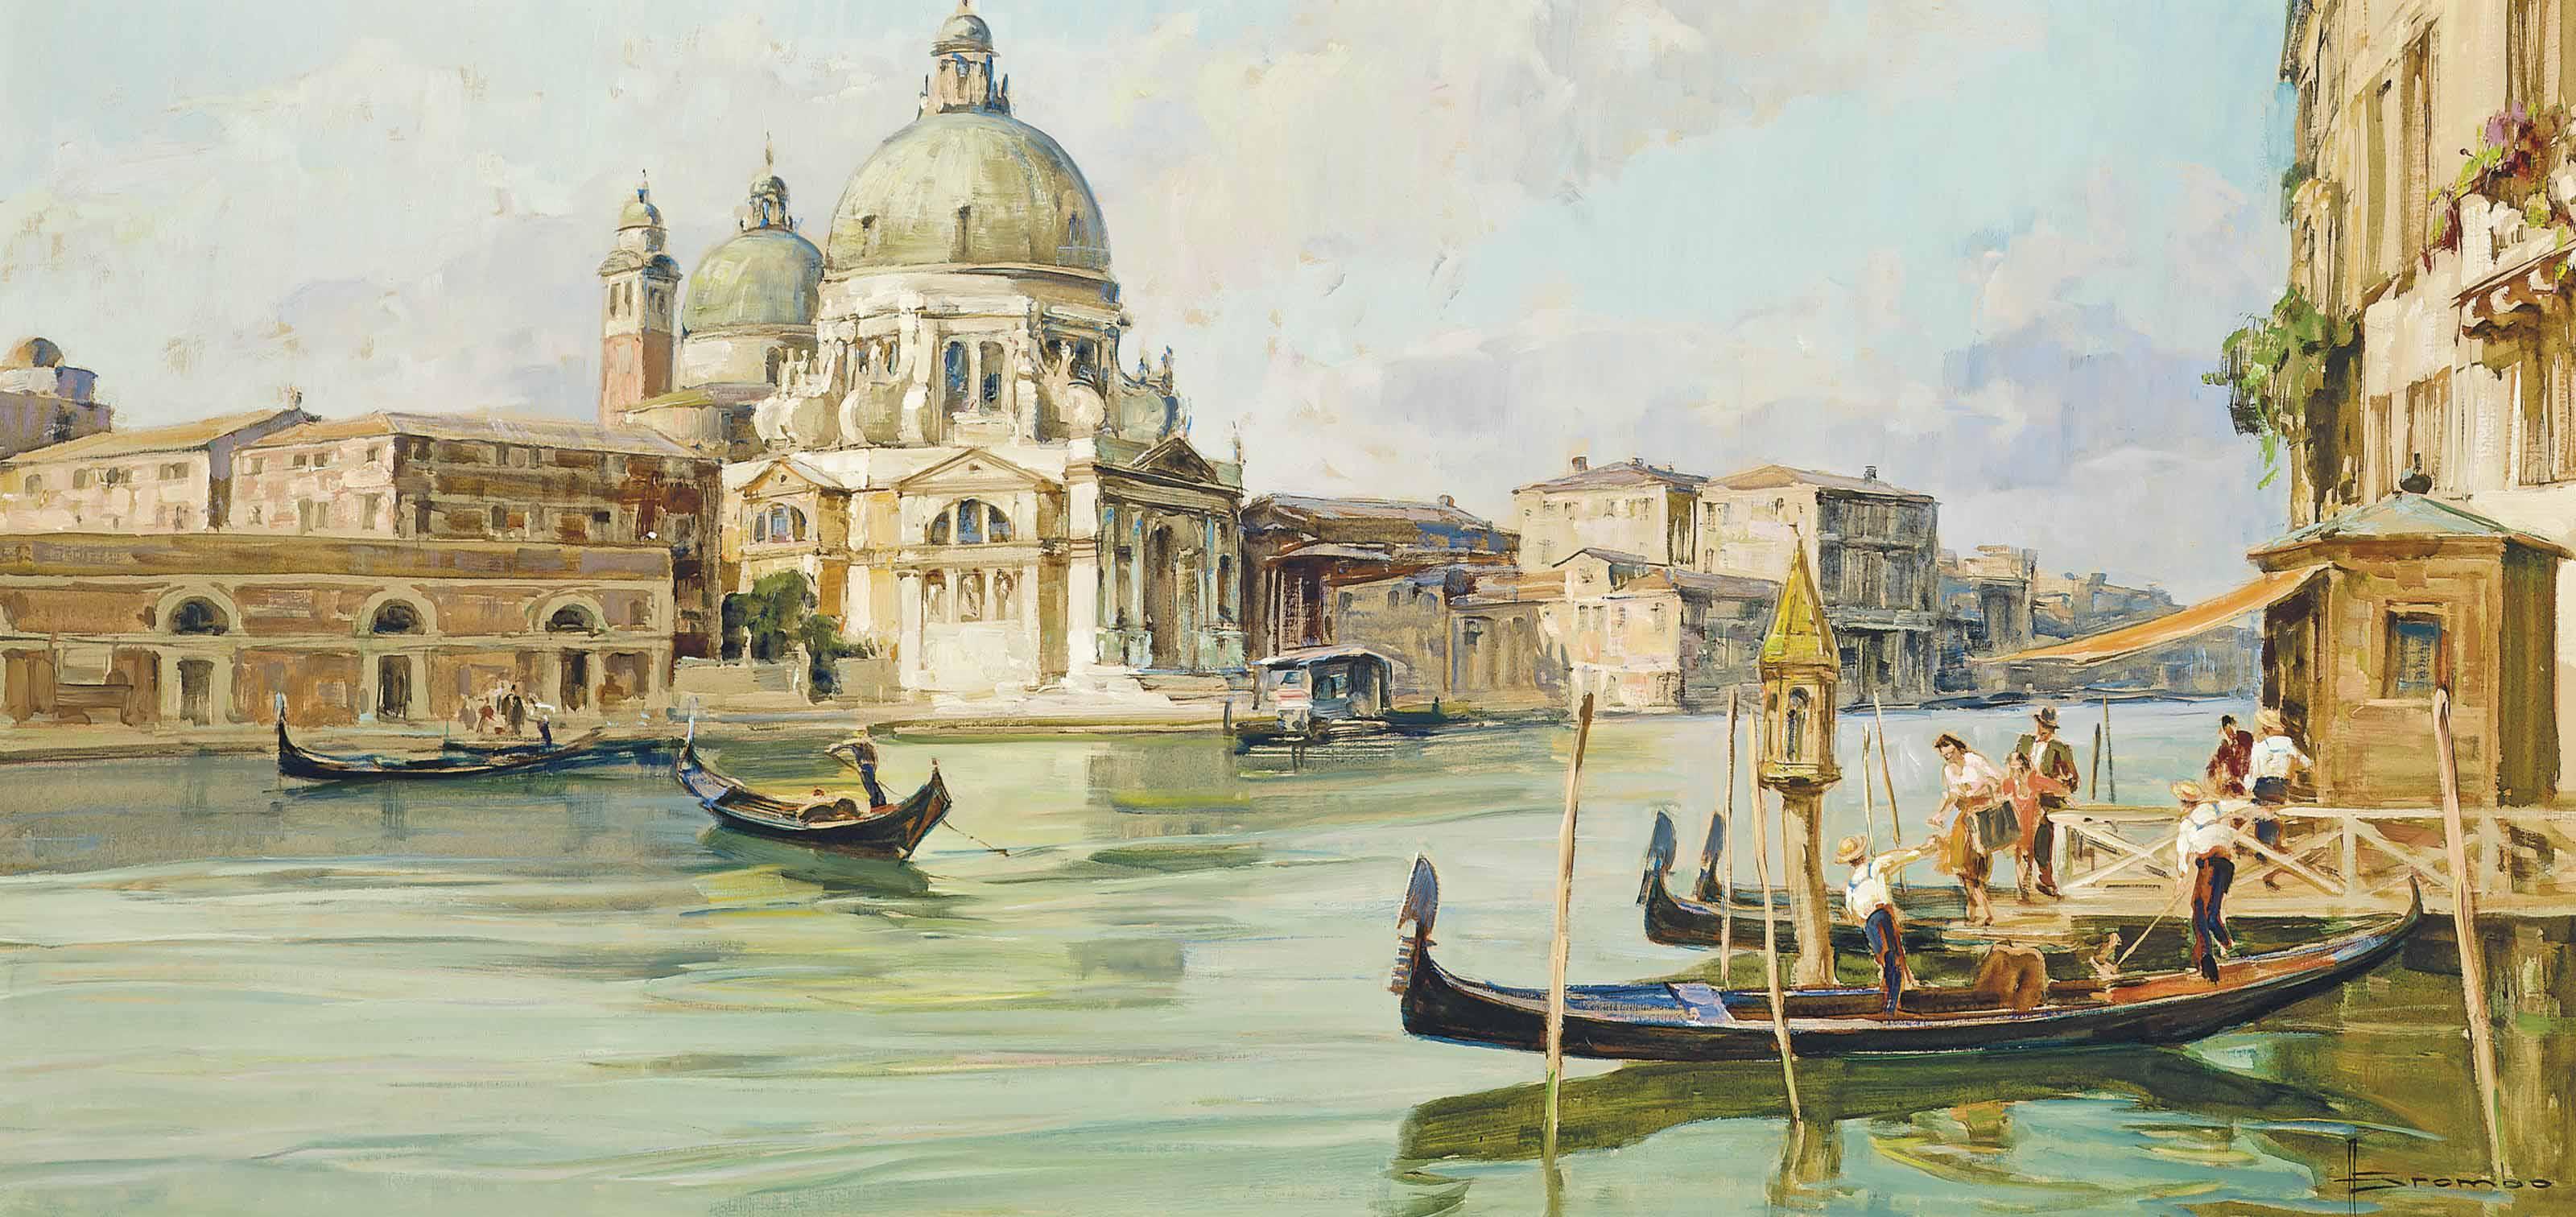 Boarding a gondola at the entrance to the Grand Canal, Santa Maria della Salute beyond